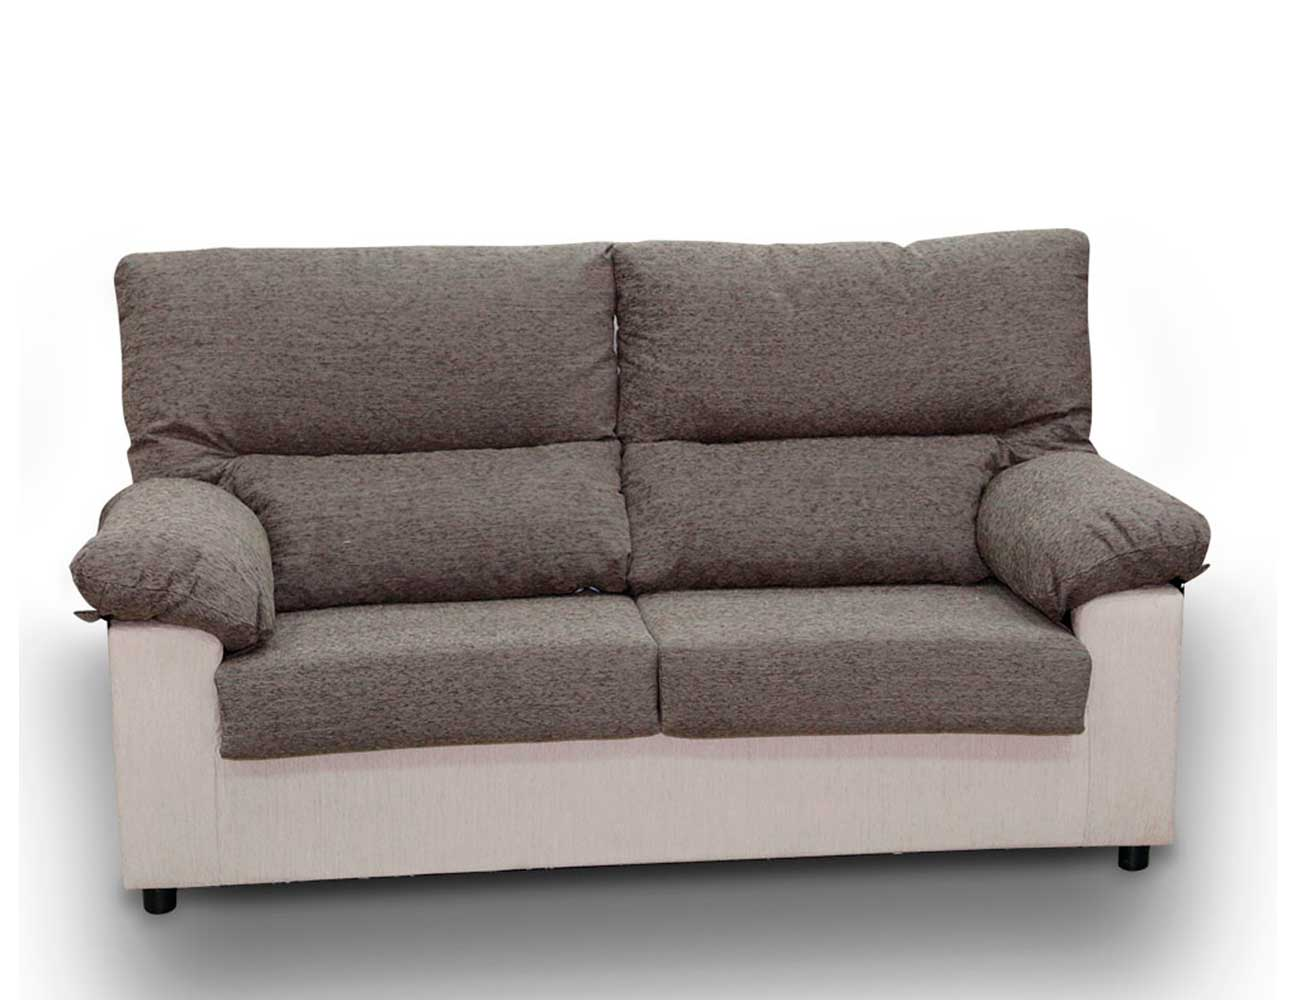 Sofa 3 plazas barato19